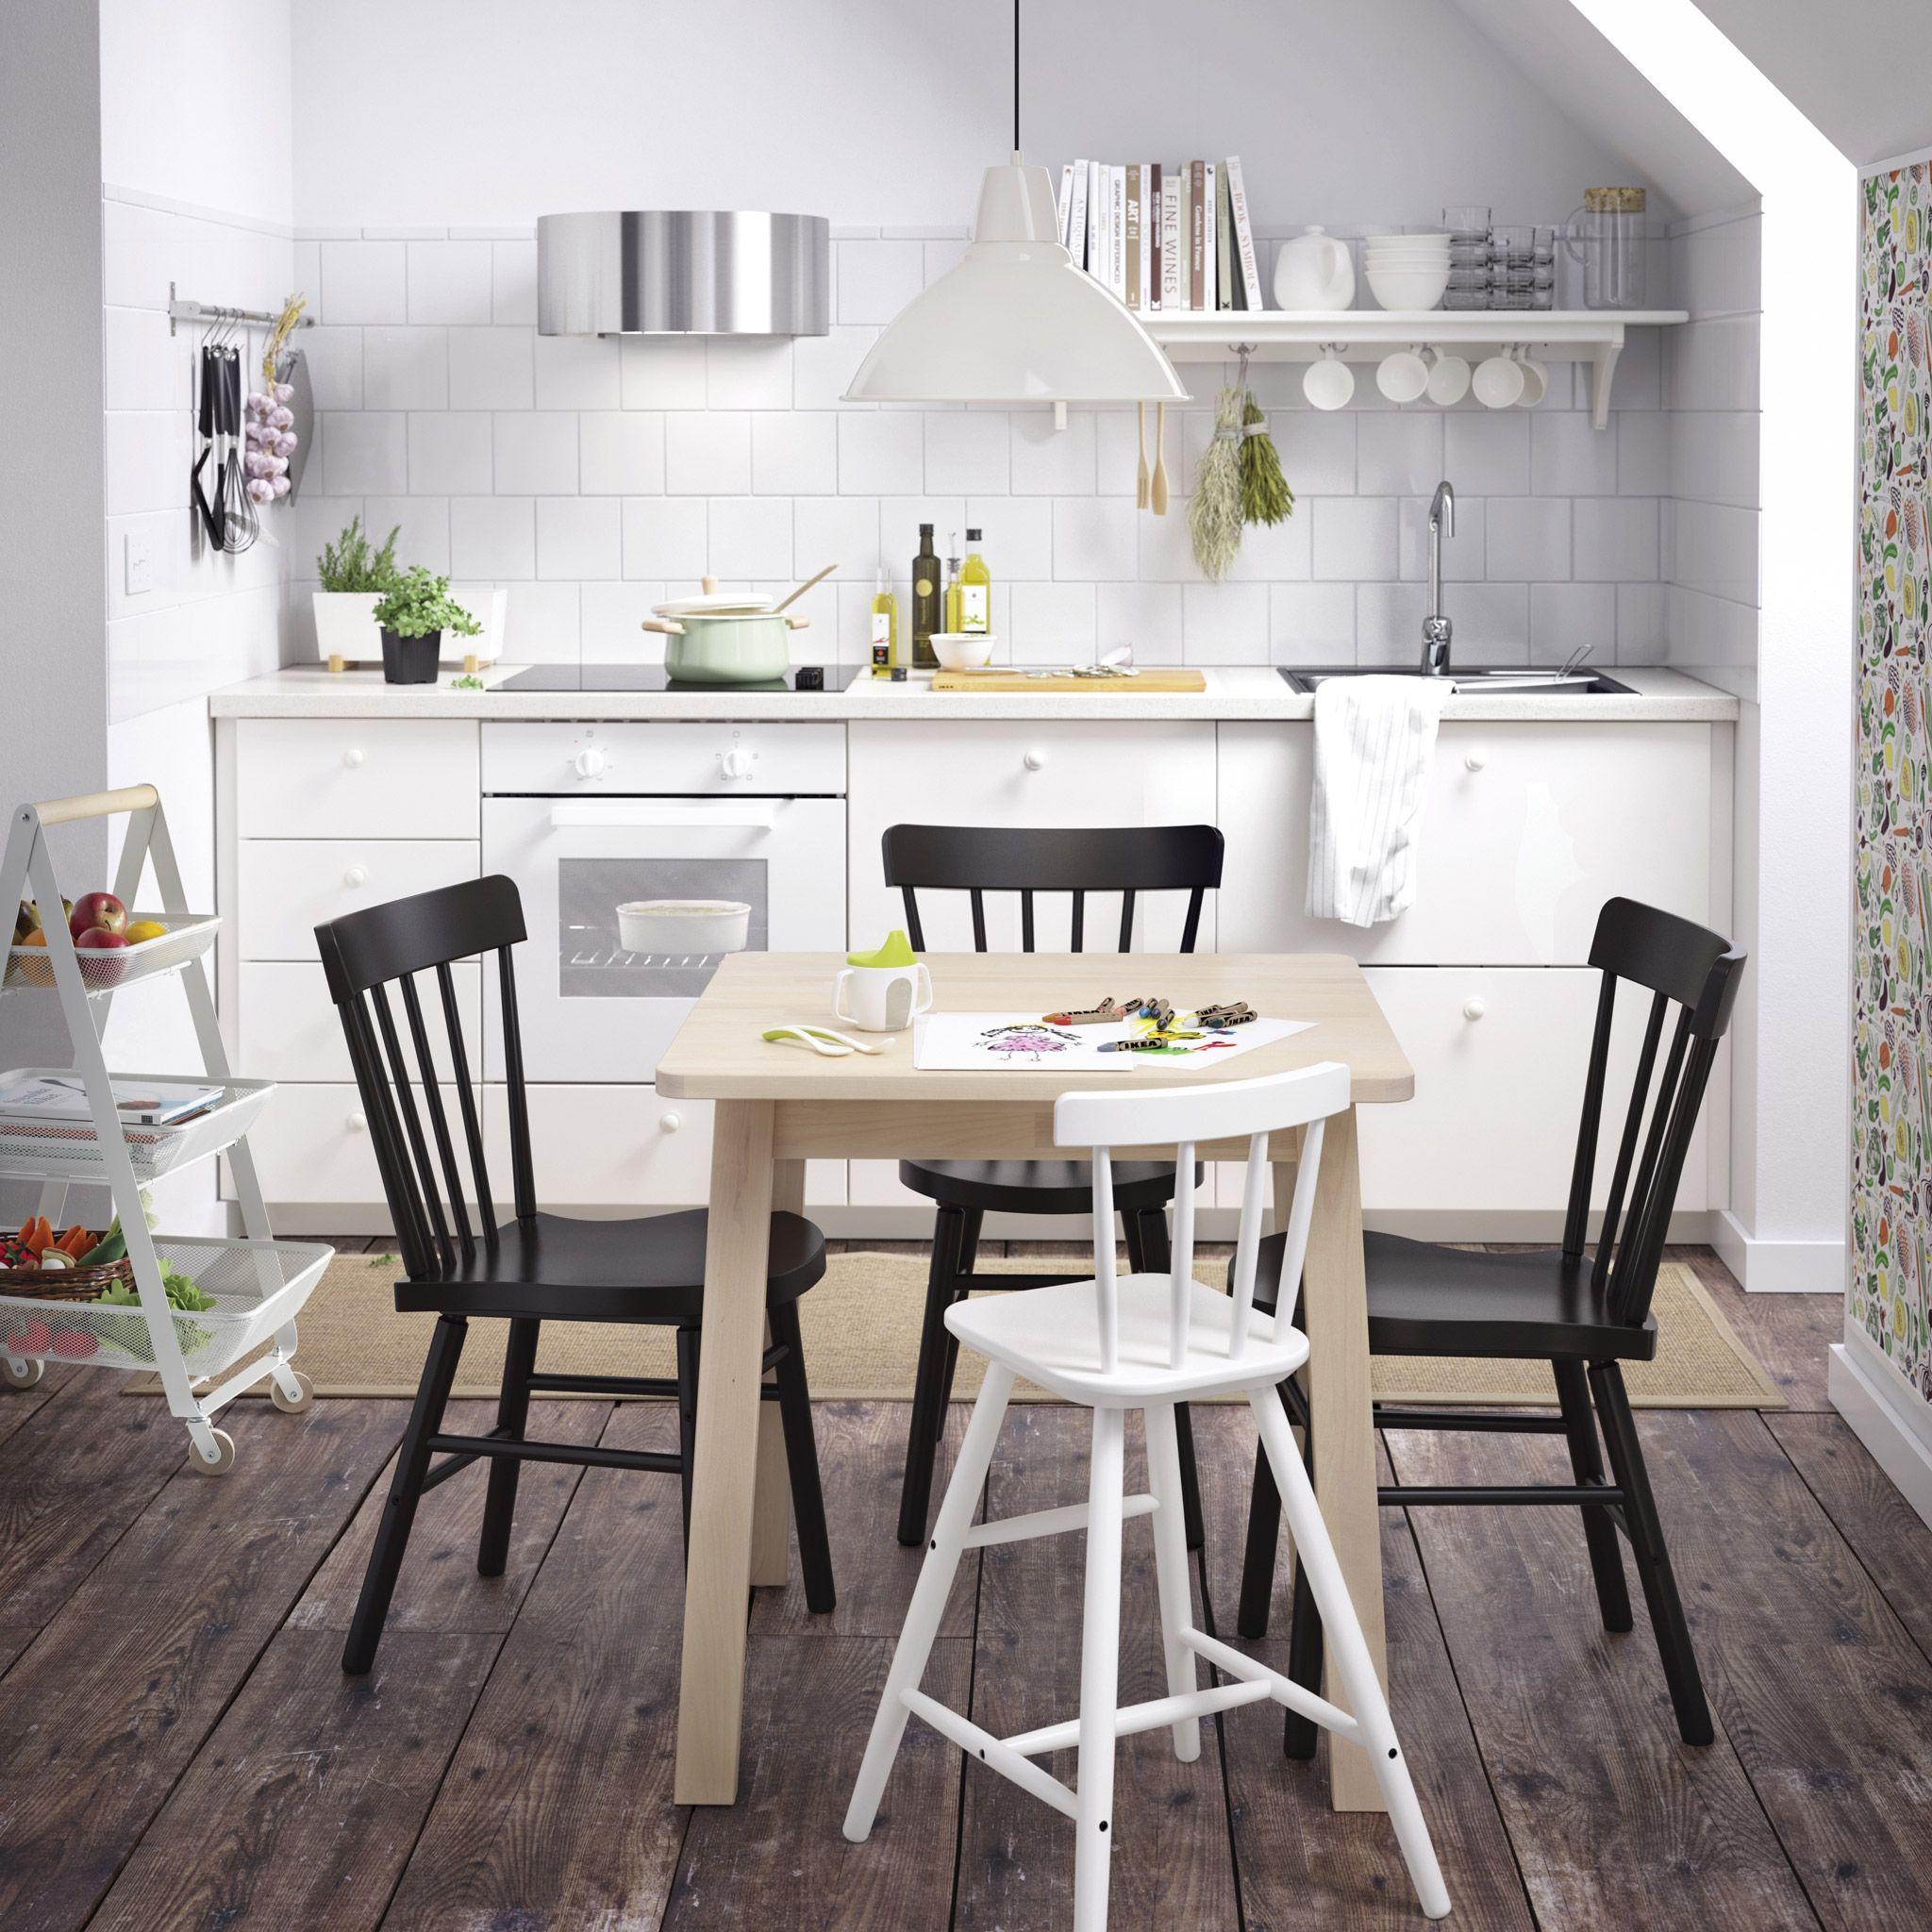 Kitchen Dining Room Table Sets | http://manageditservicesatlanta.net ...